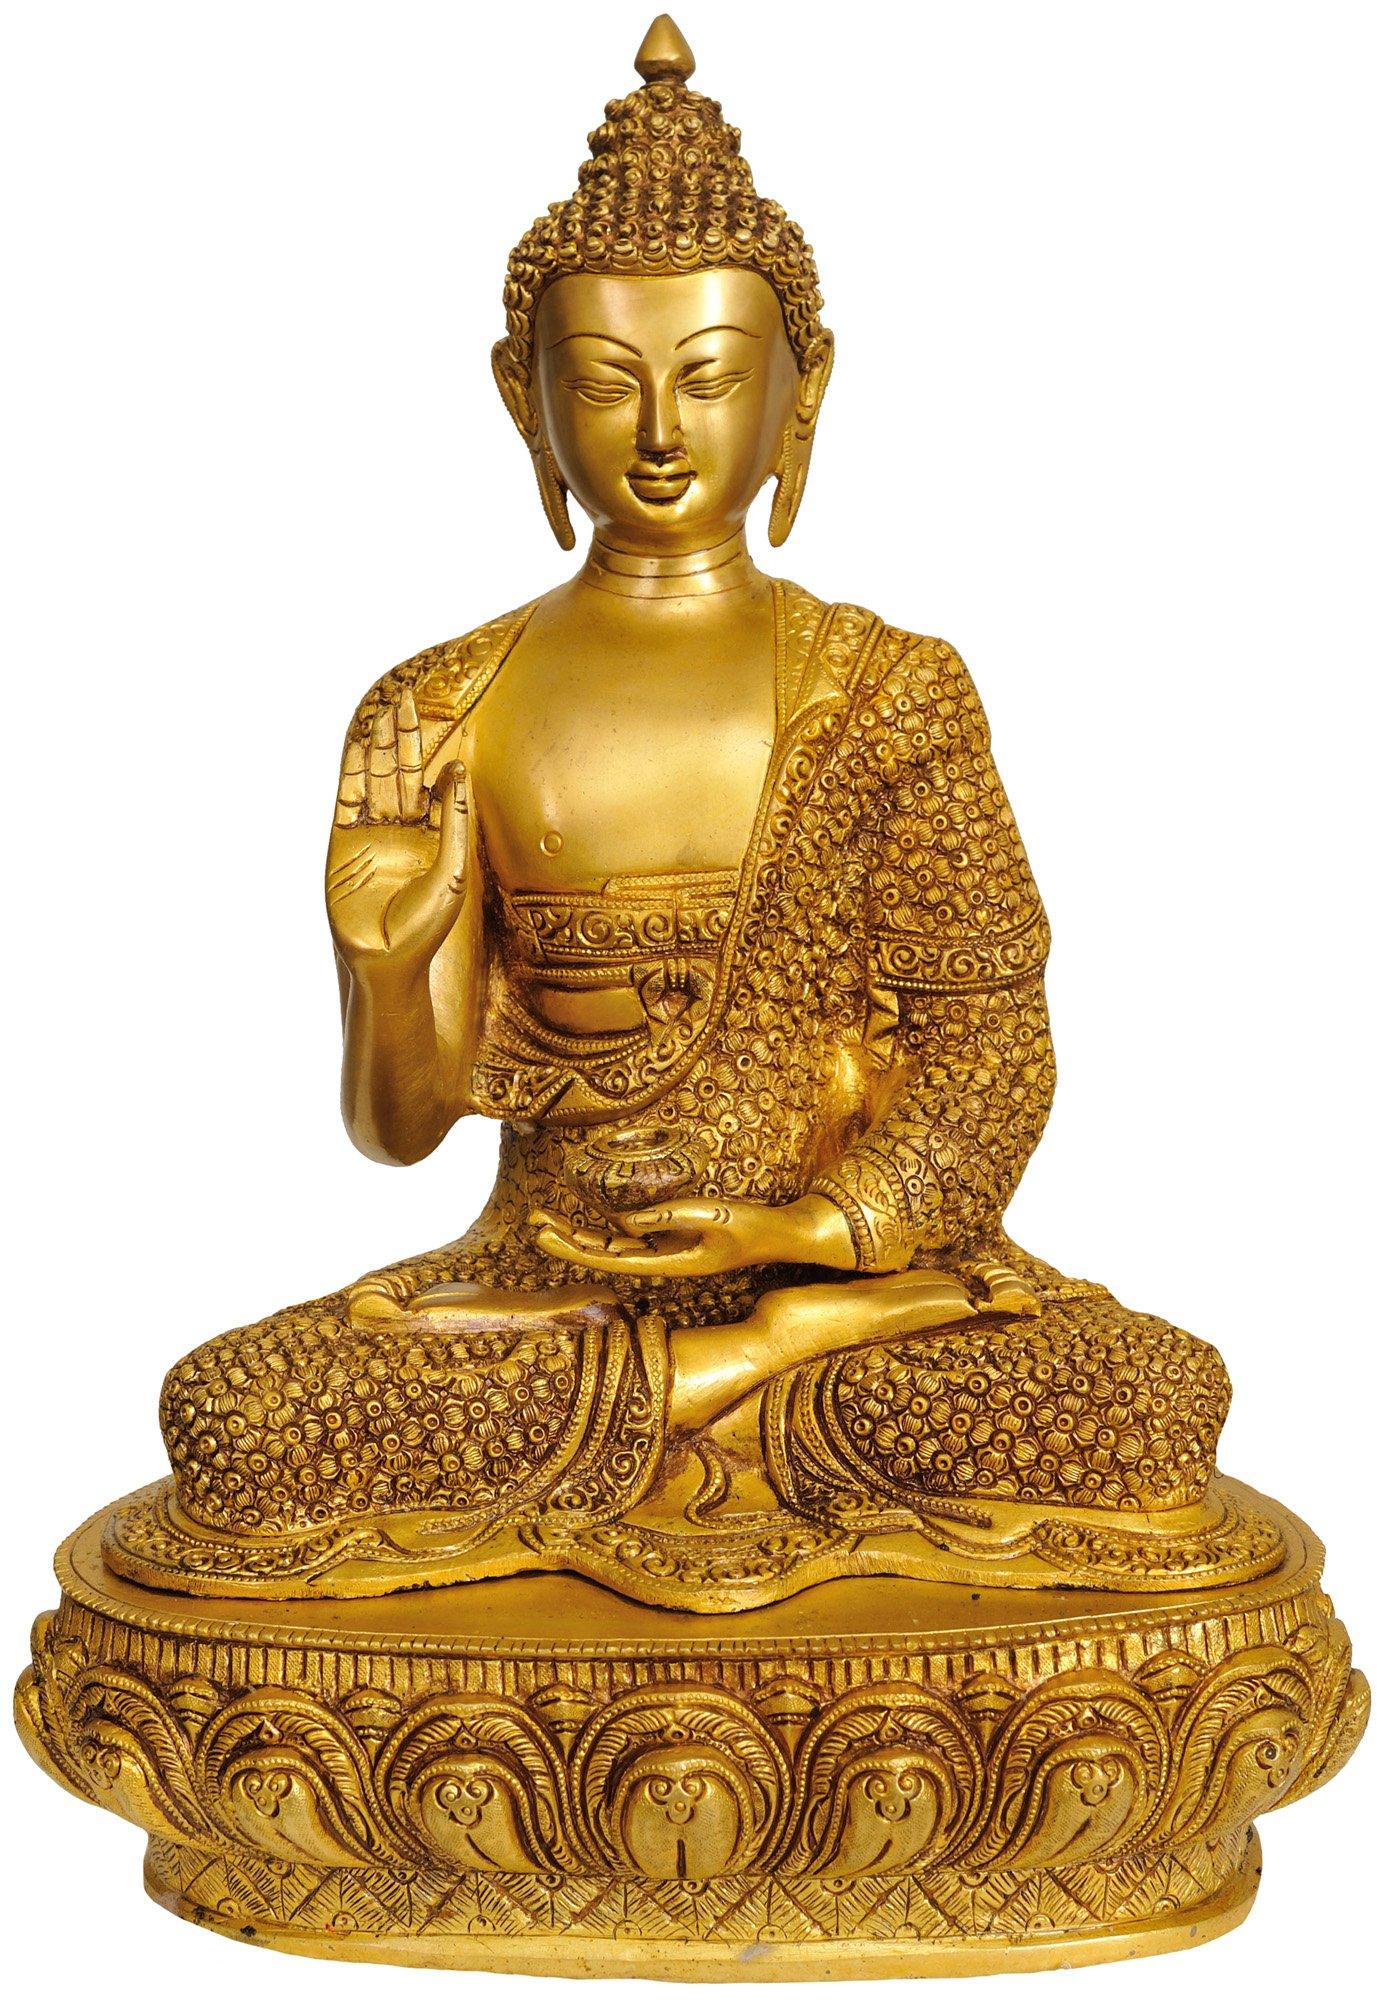 Exotic India ZBT77 Shakyamuni Buddha in Teaching Mudra with Lotus on His Garment & Om Mani Padme Hum on Reverse